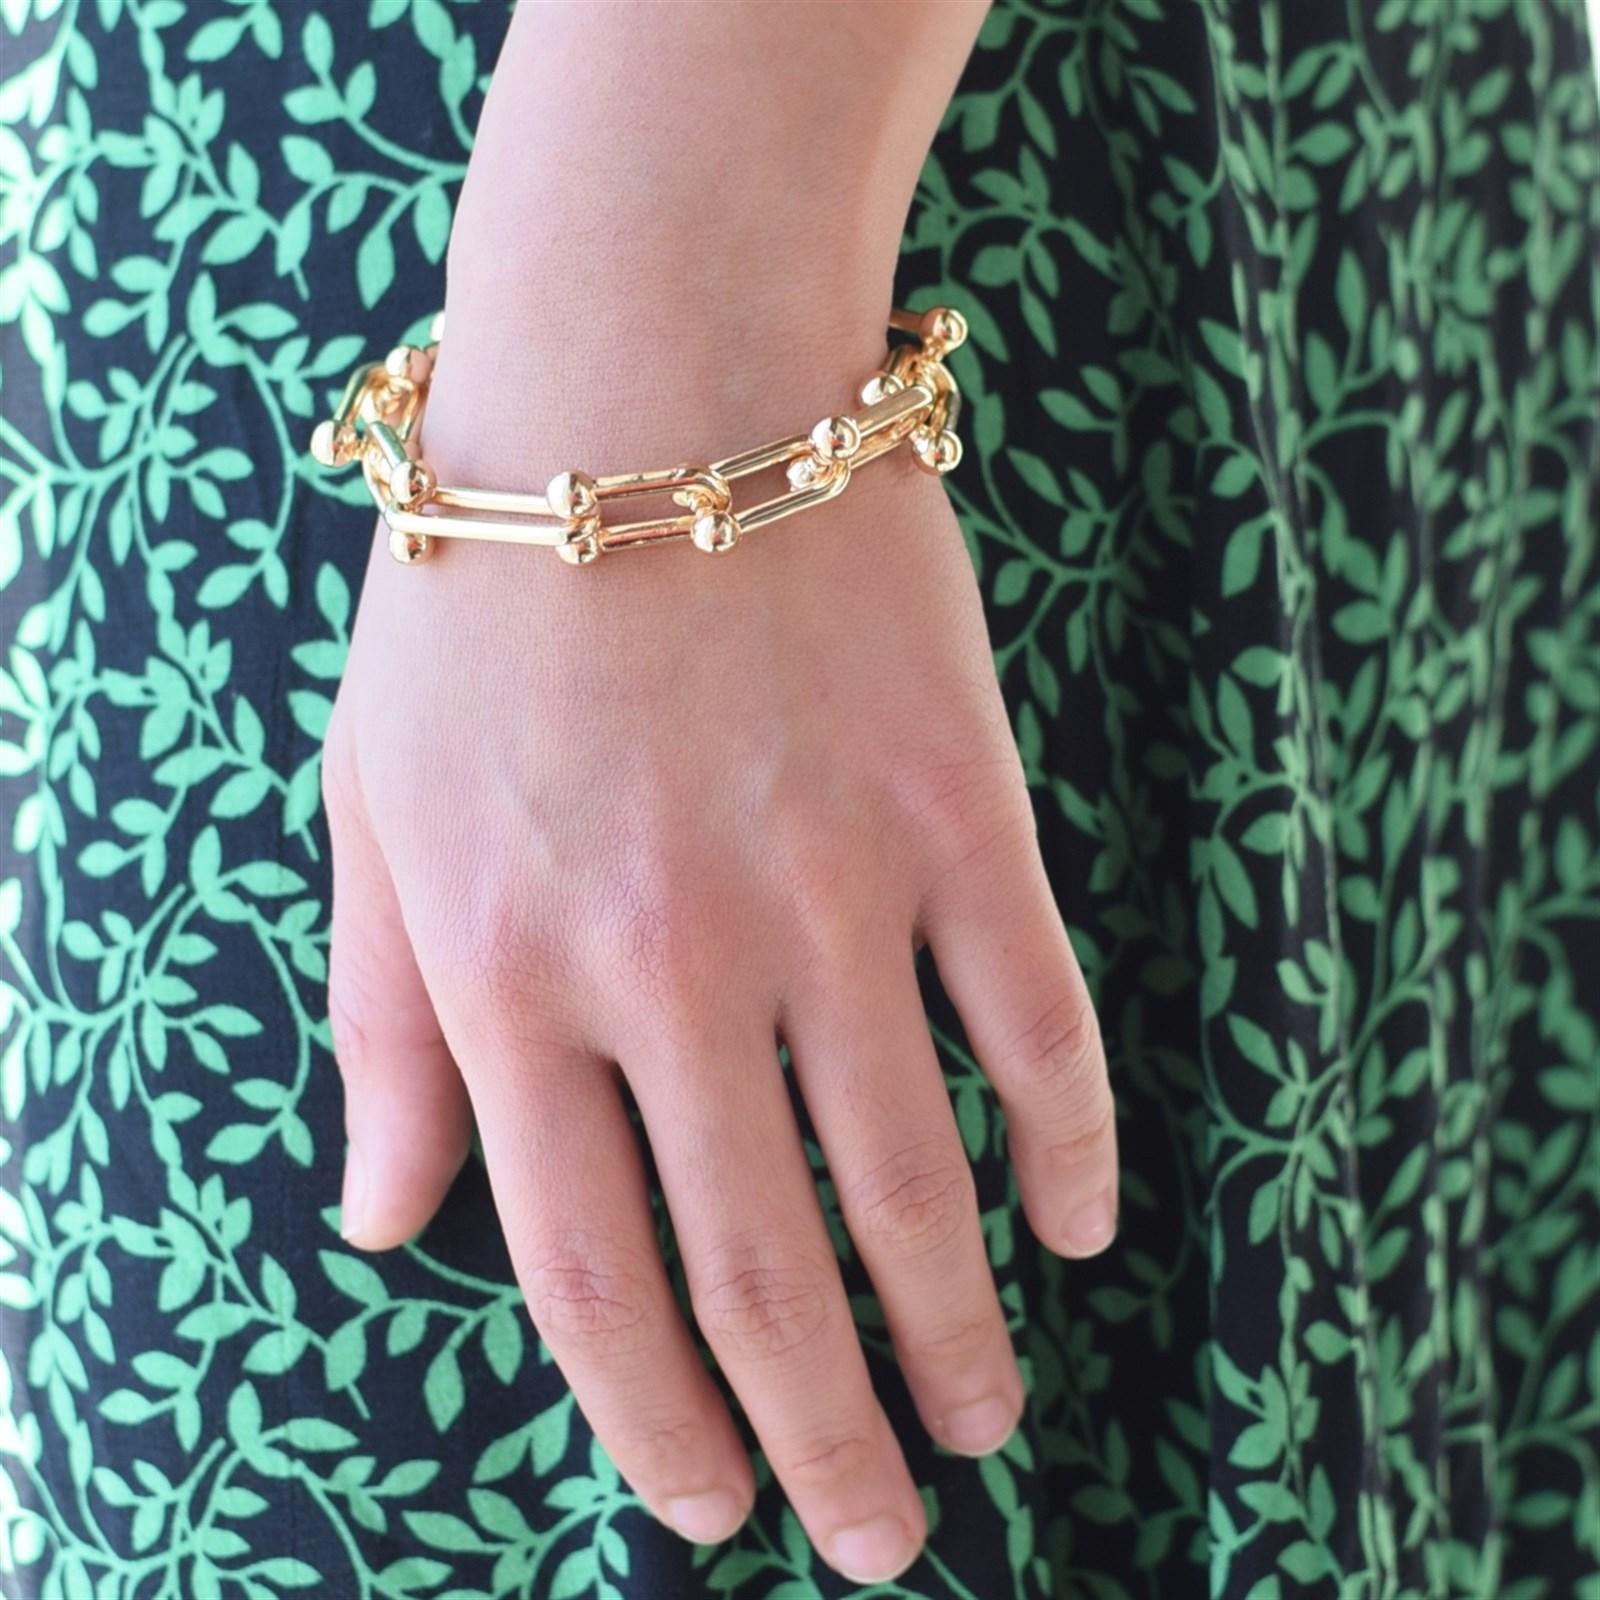 Brooklyn Trendy Chain Toggle Bracelet